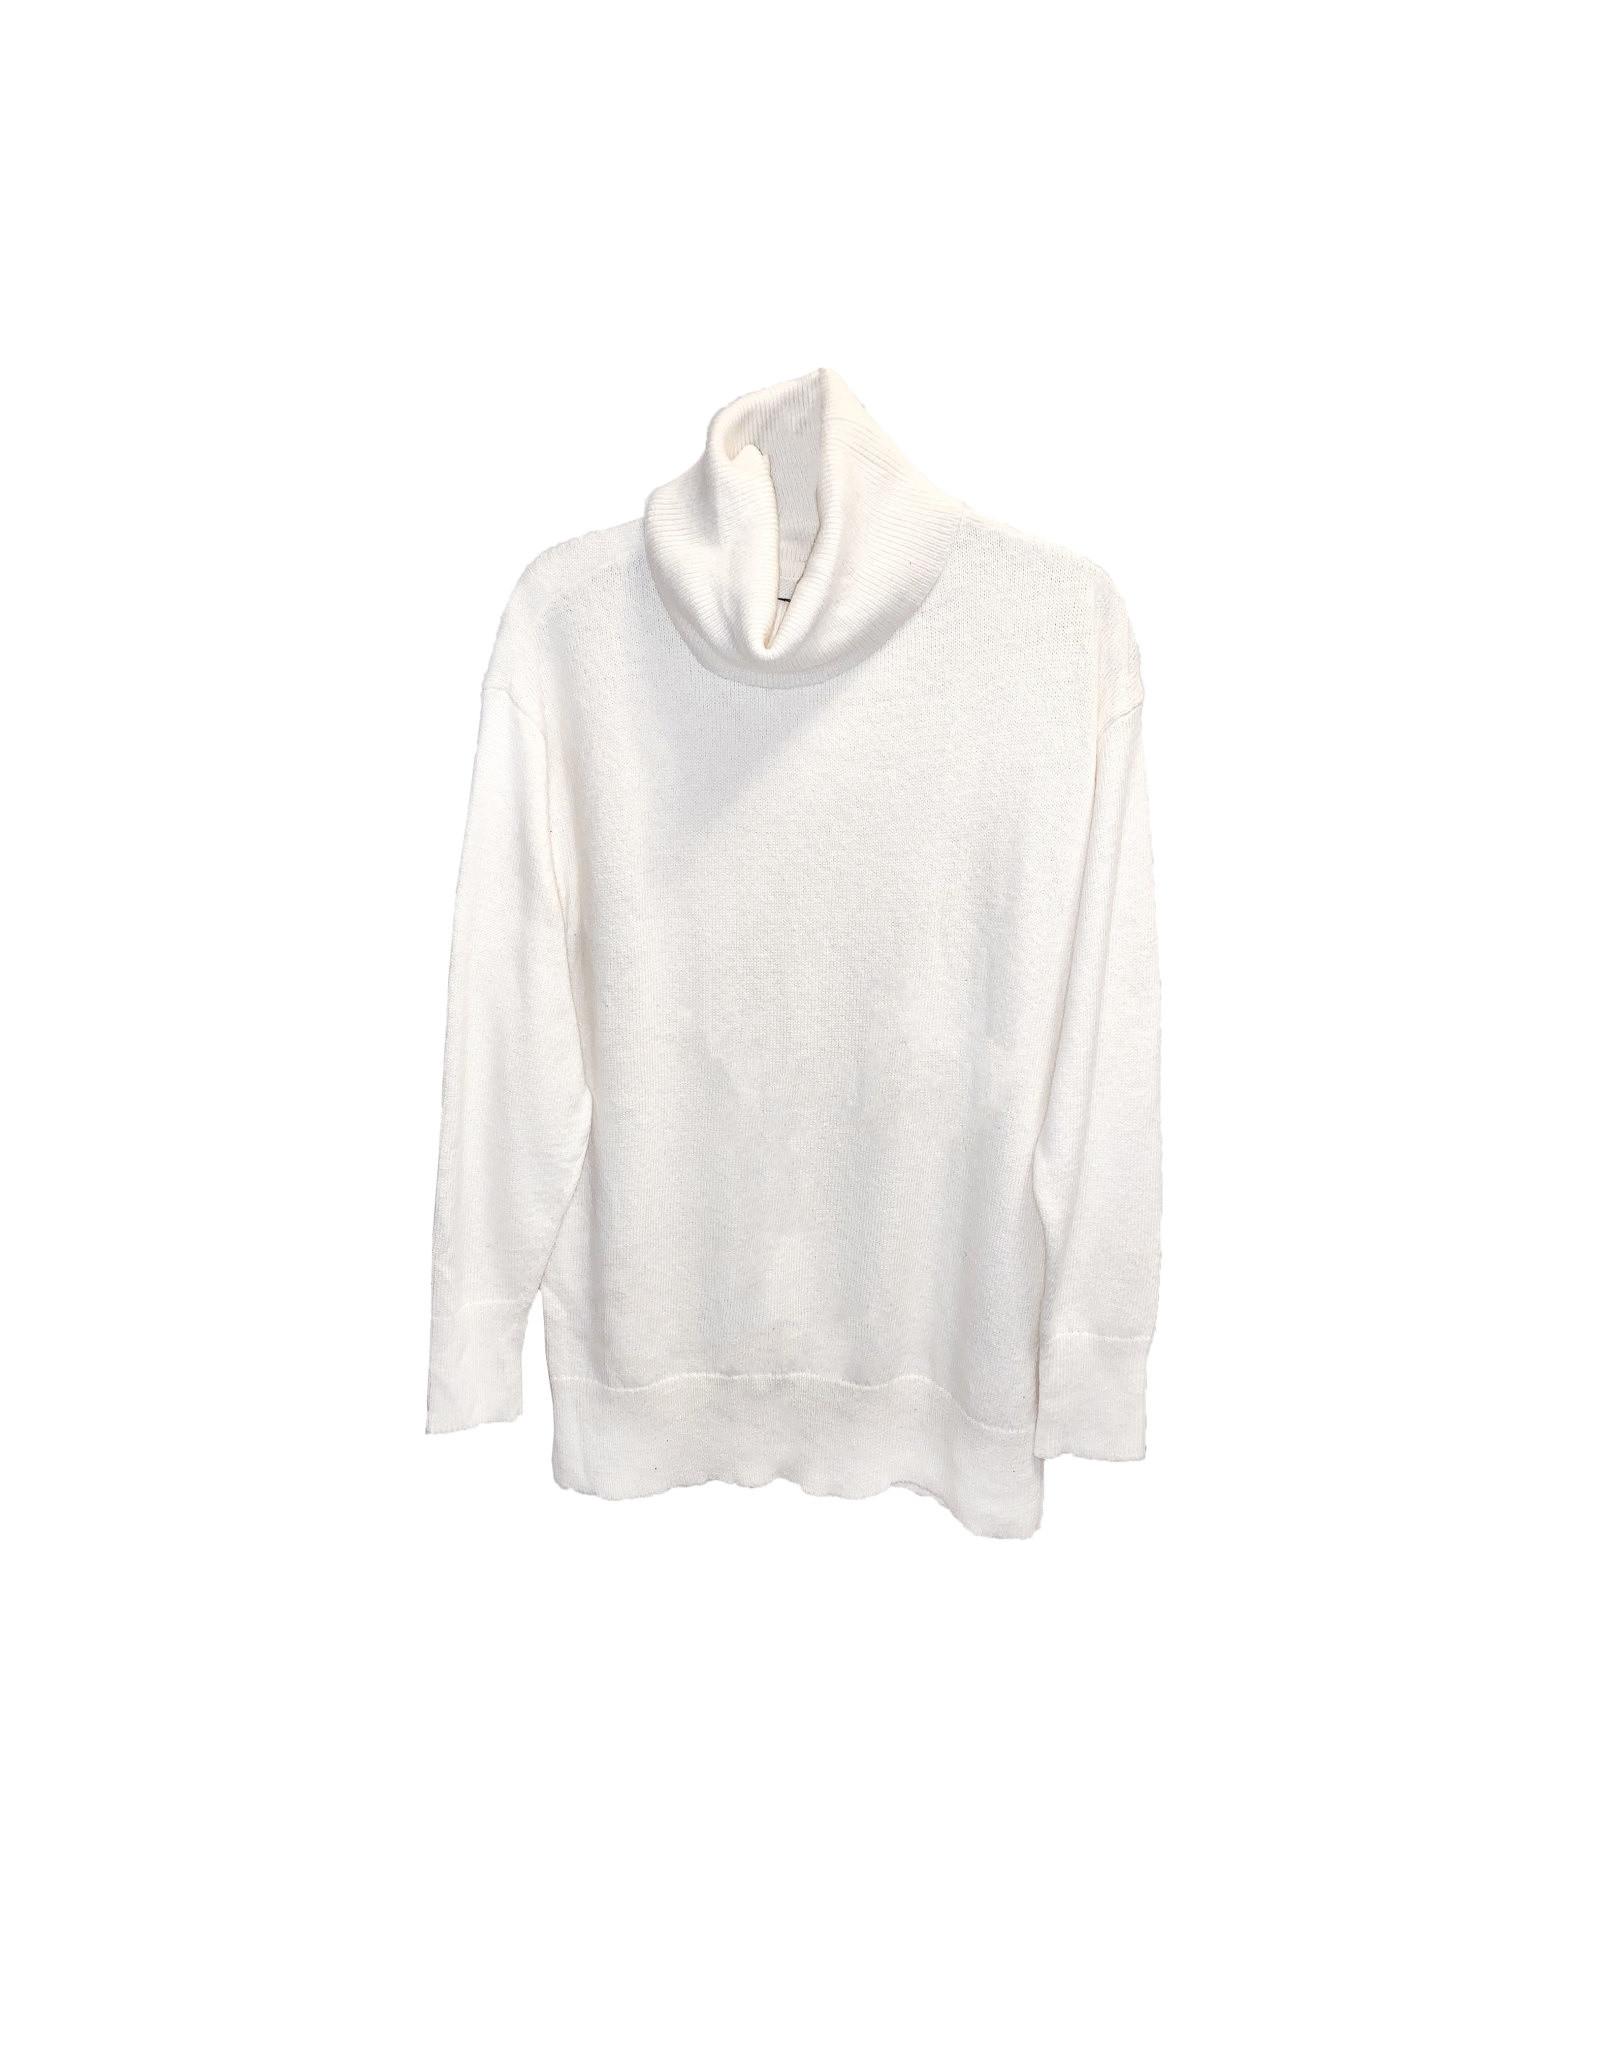 CHAPS Chaps Turtleneck Sweater  Size S